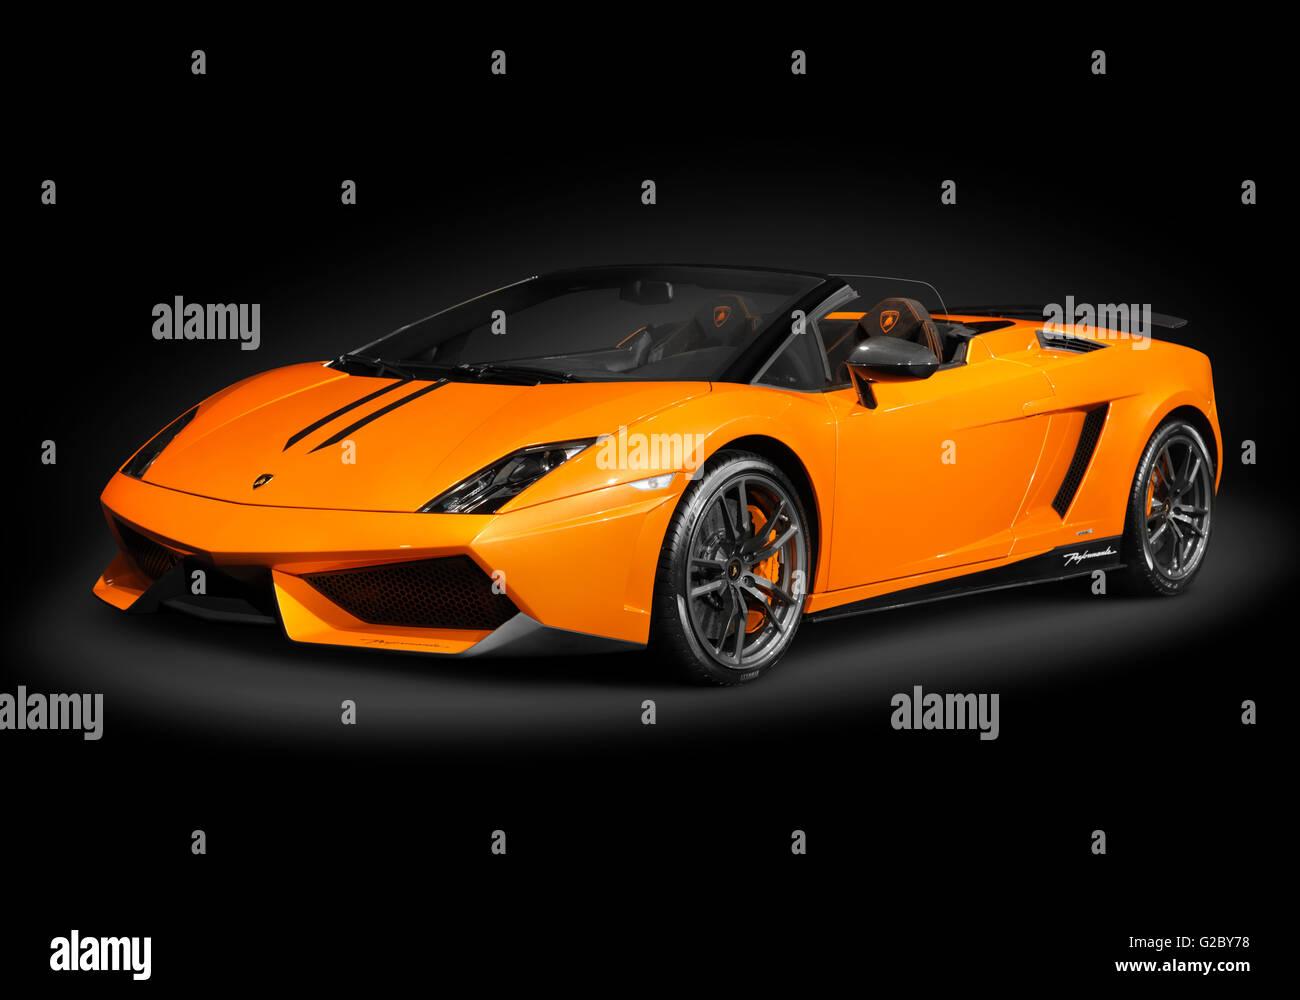 Orange Lamborghini Gallardo LP570 4 Spyder Performante   Stock Image